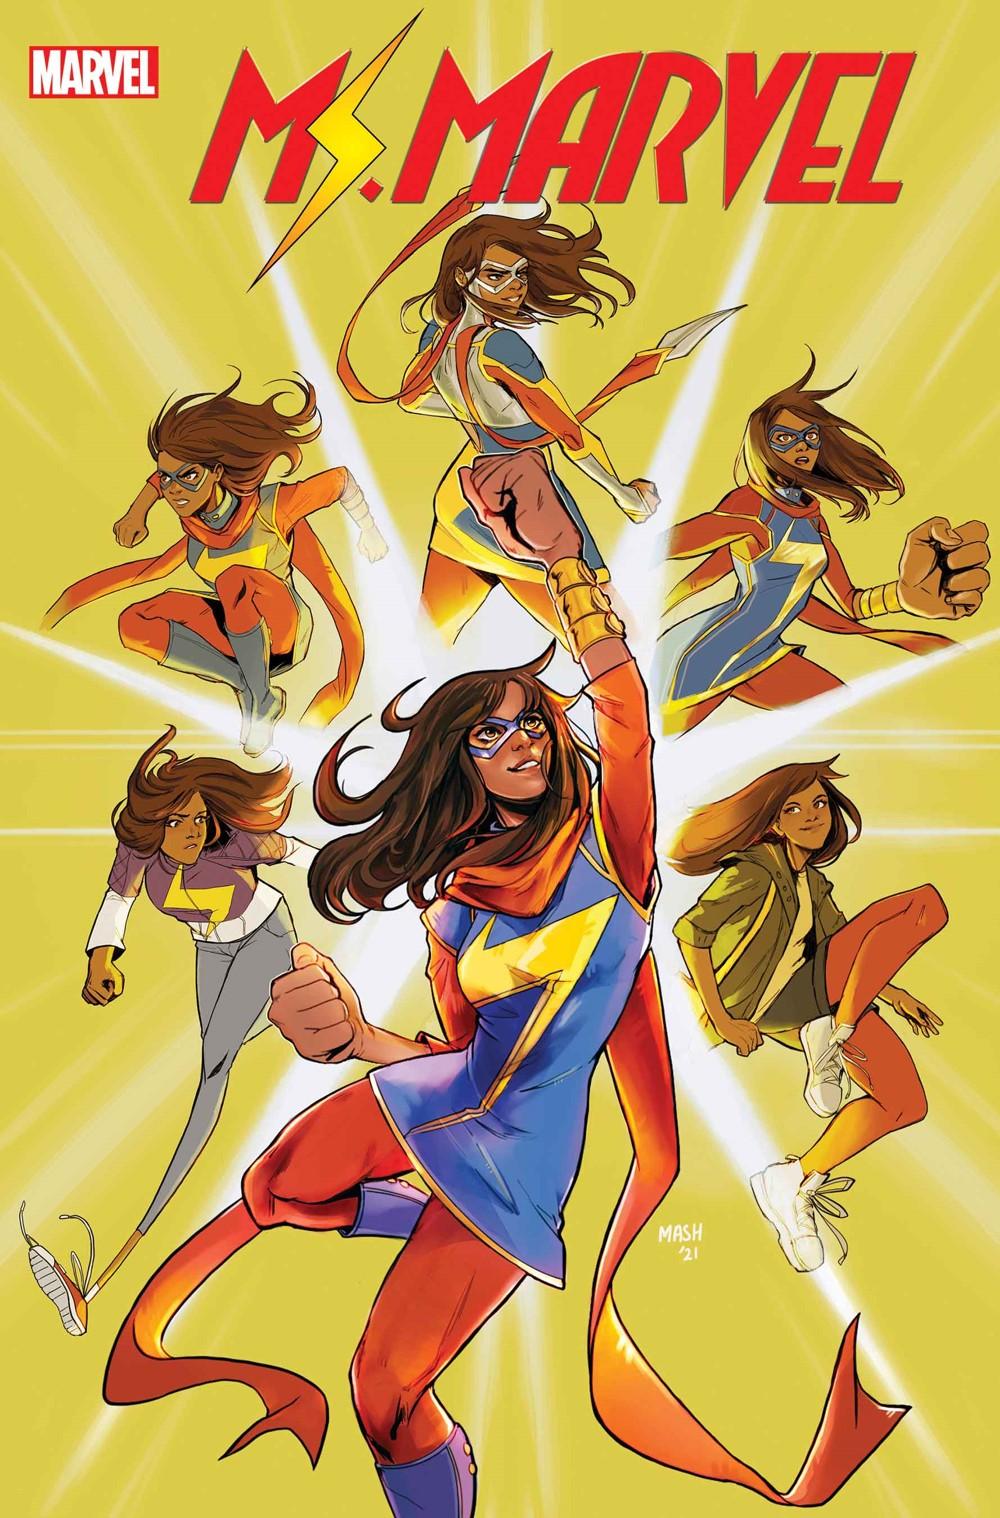 MSMARV2021001_cover_Ahmed Marvel Comics December 2021 Solicitations